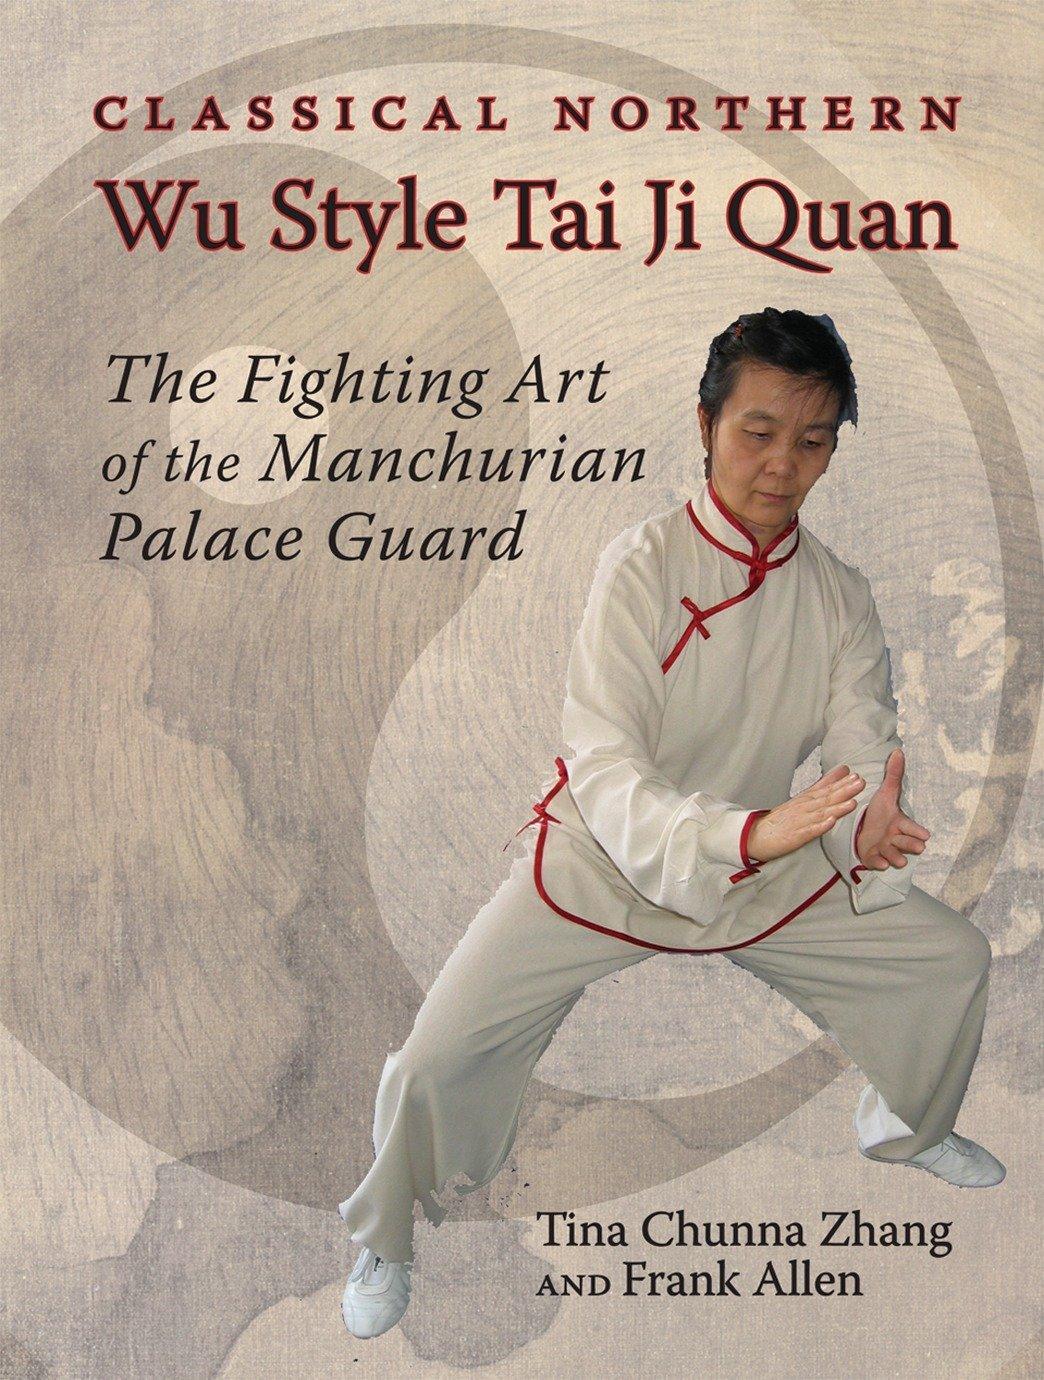 Download Classical Northern Wu Style Tai Ji Quan: The Fighting Art of the Manchurian Palace Guard pdf